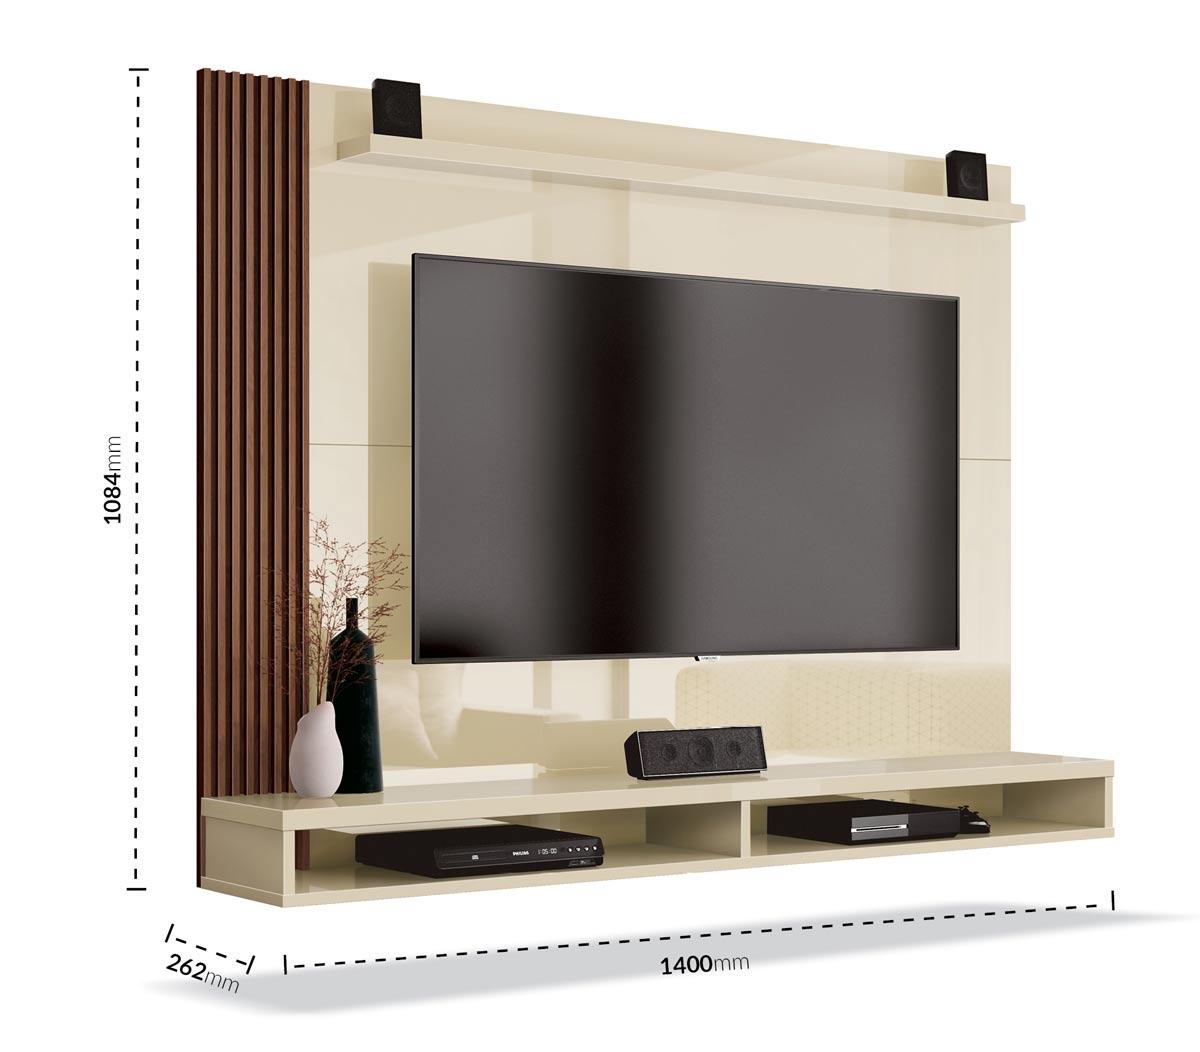 Painel para TV Dijon Off White com Naturale - EDN Móveis